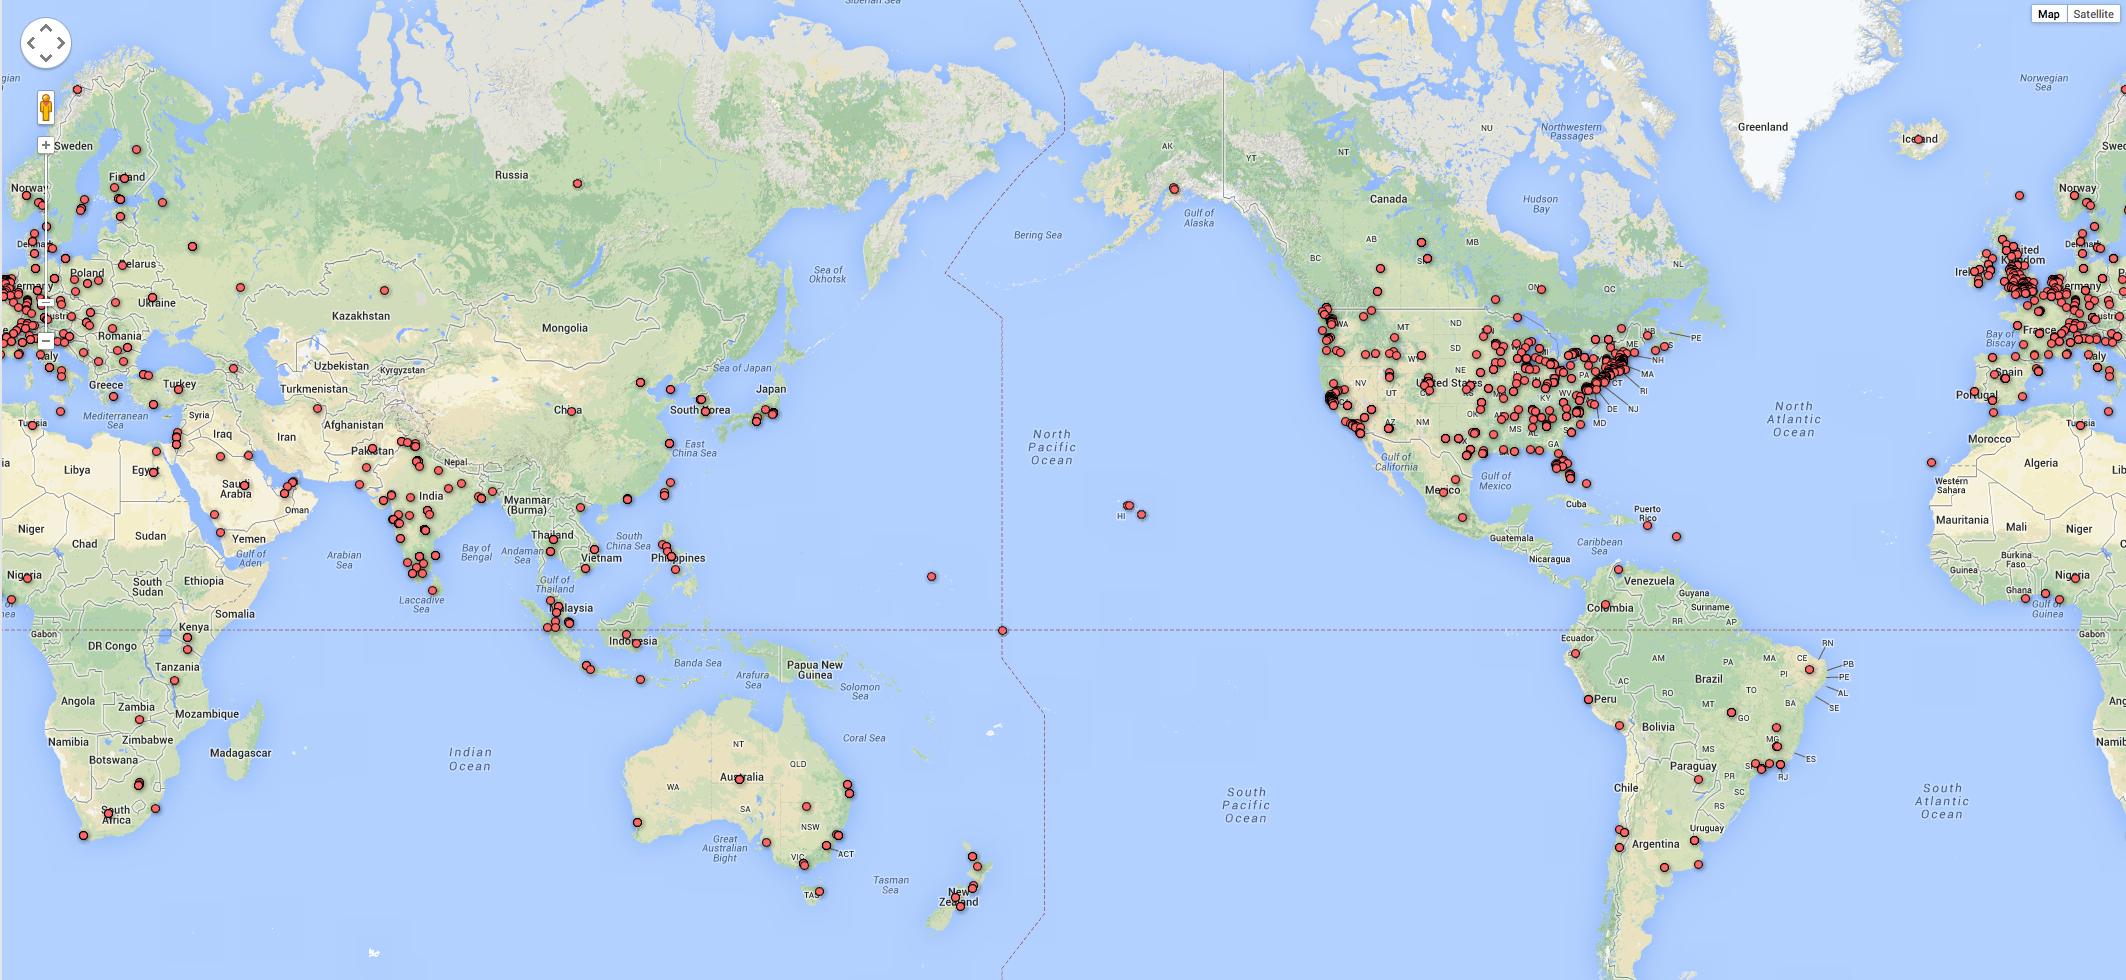 followers global